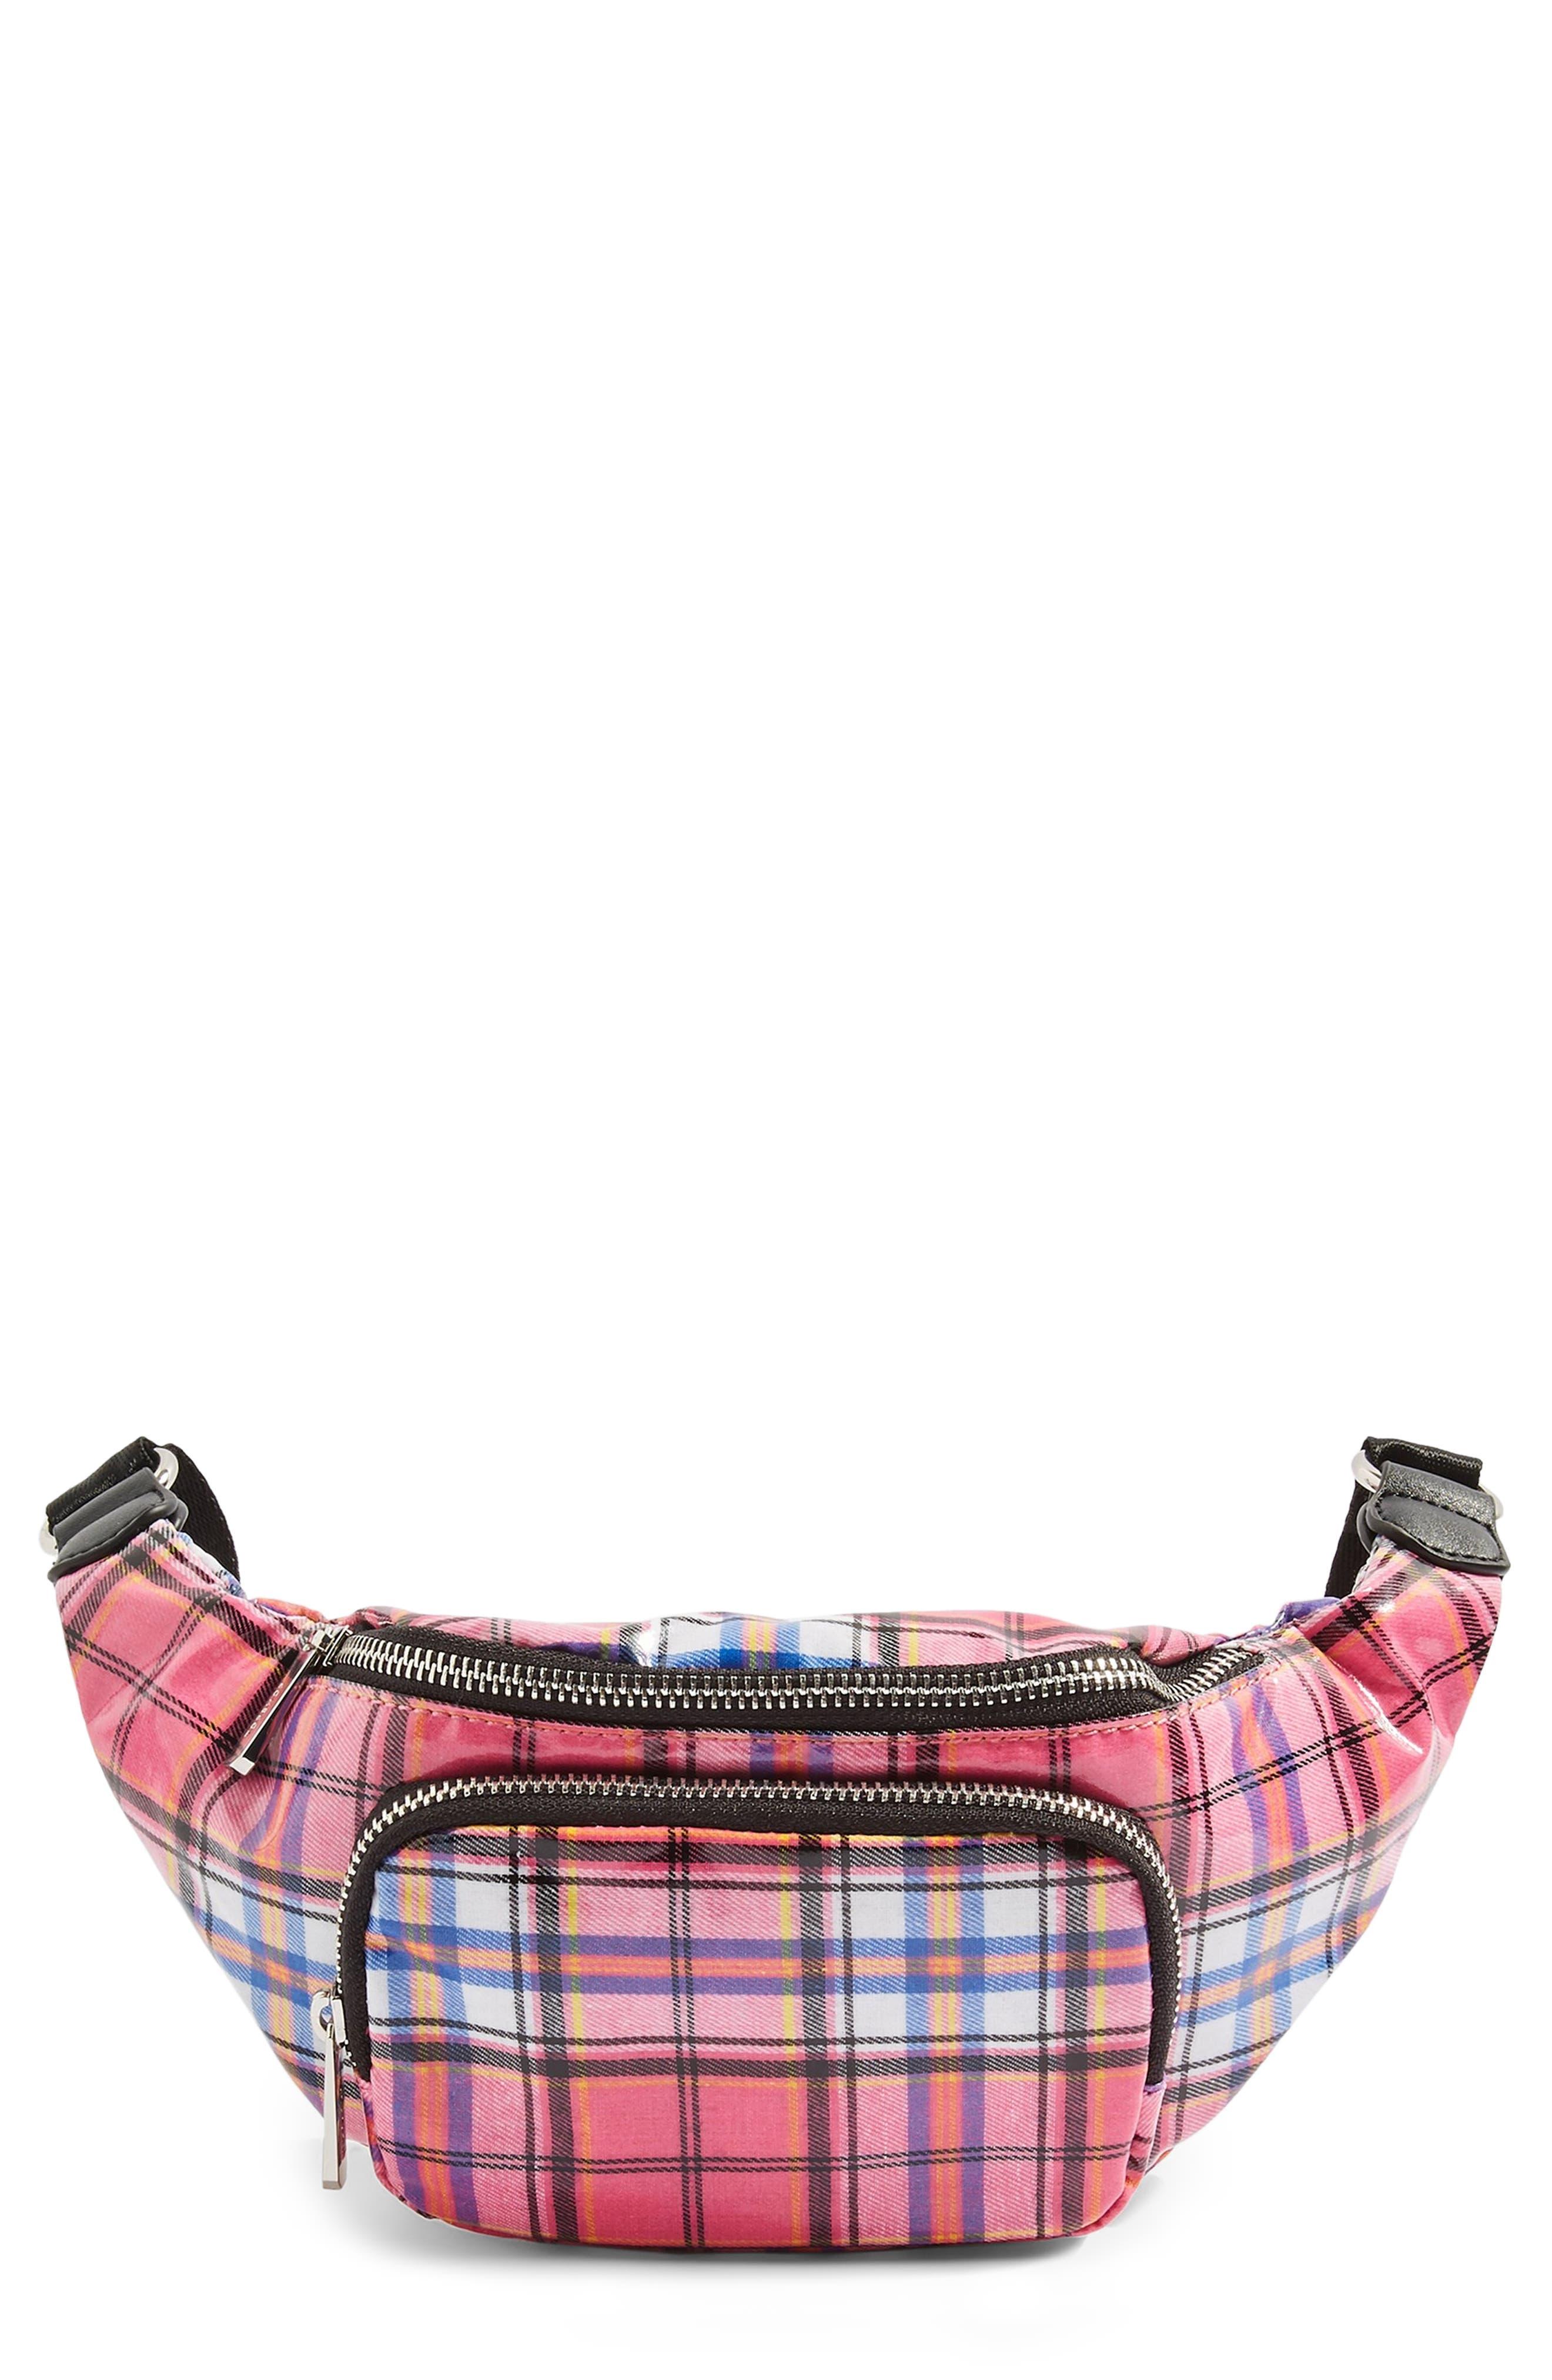 Callie Check Belt Bag,                             Main thumbnail 1, color,                             650